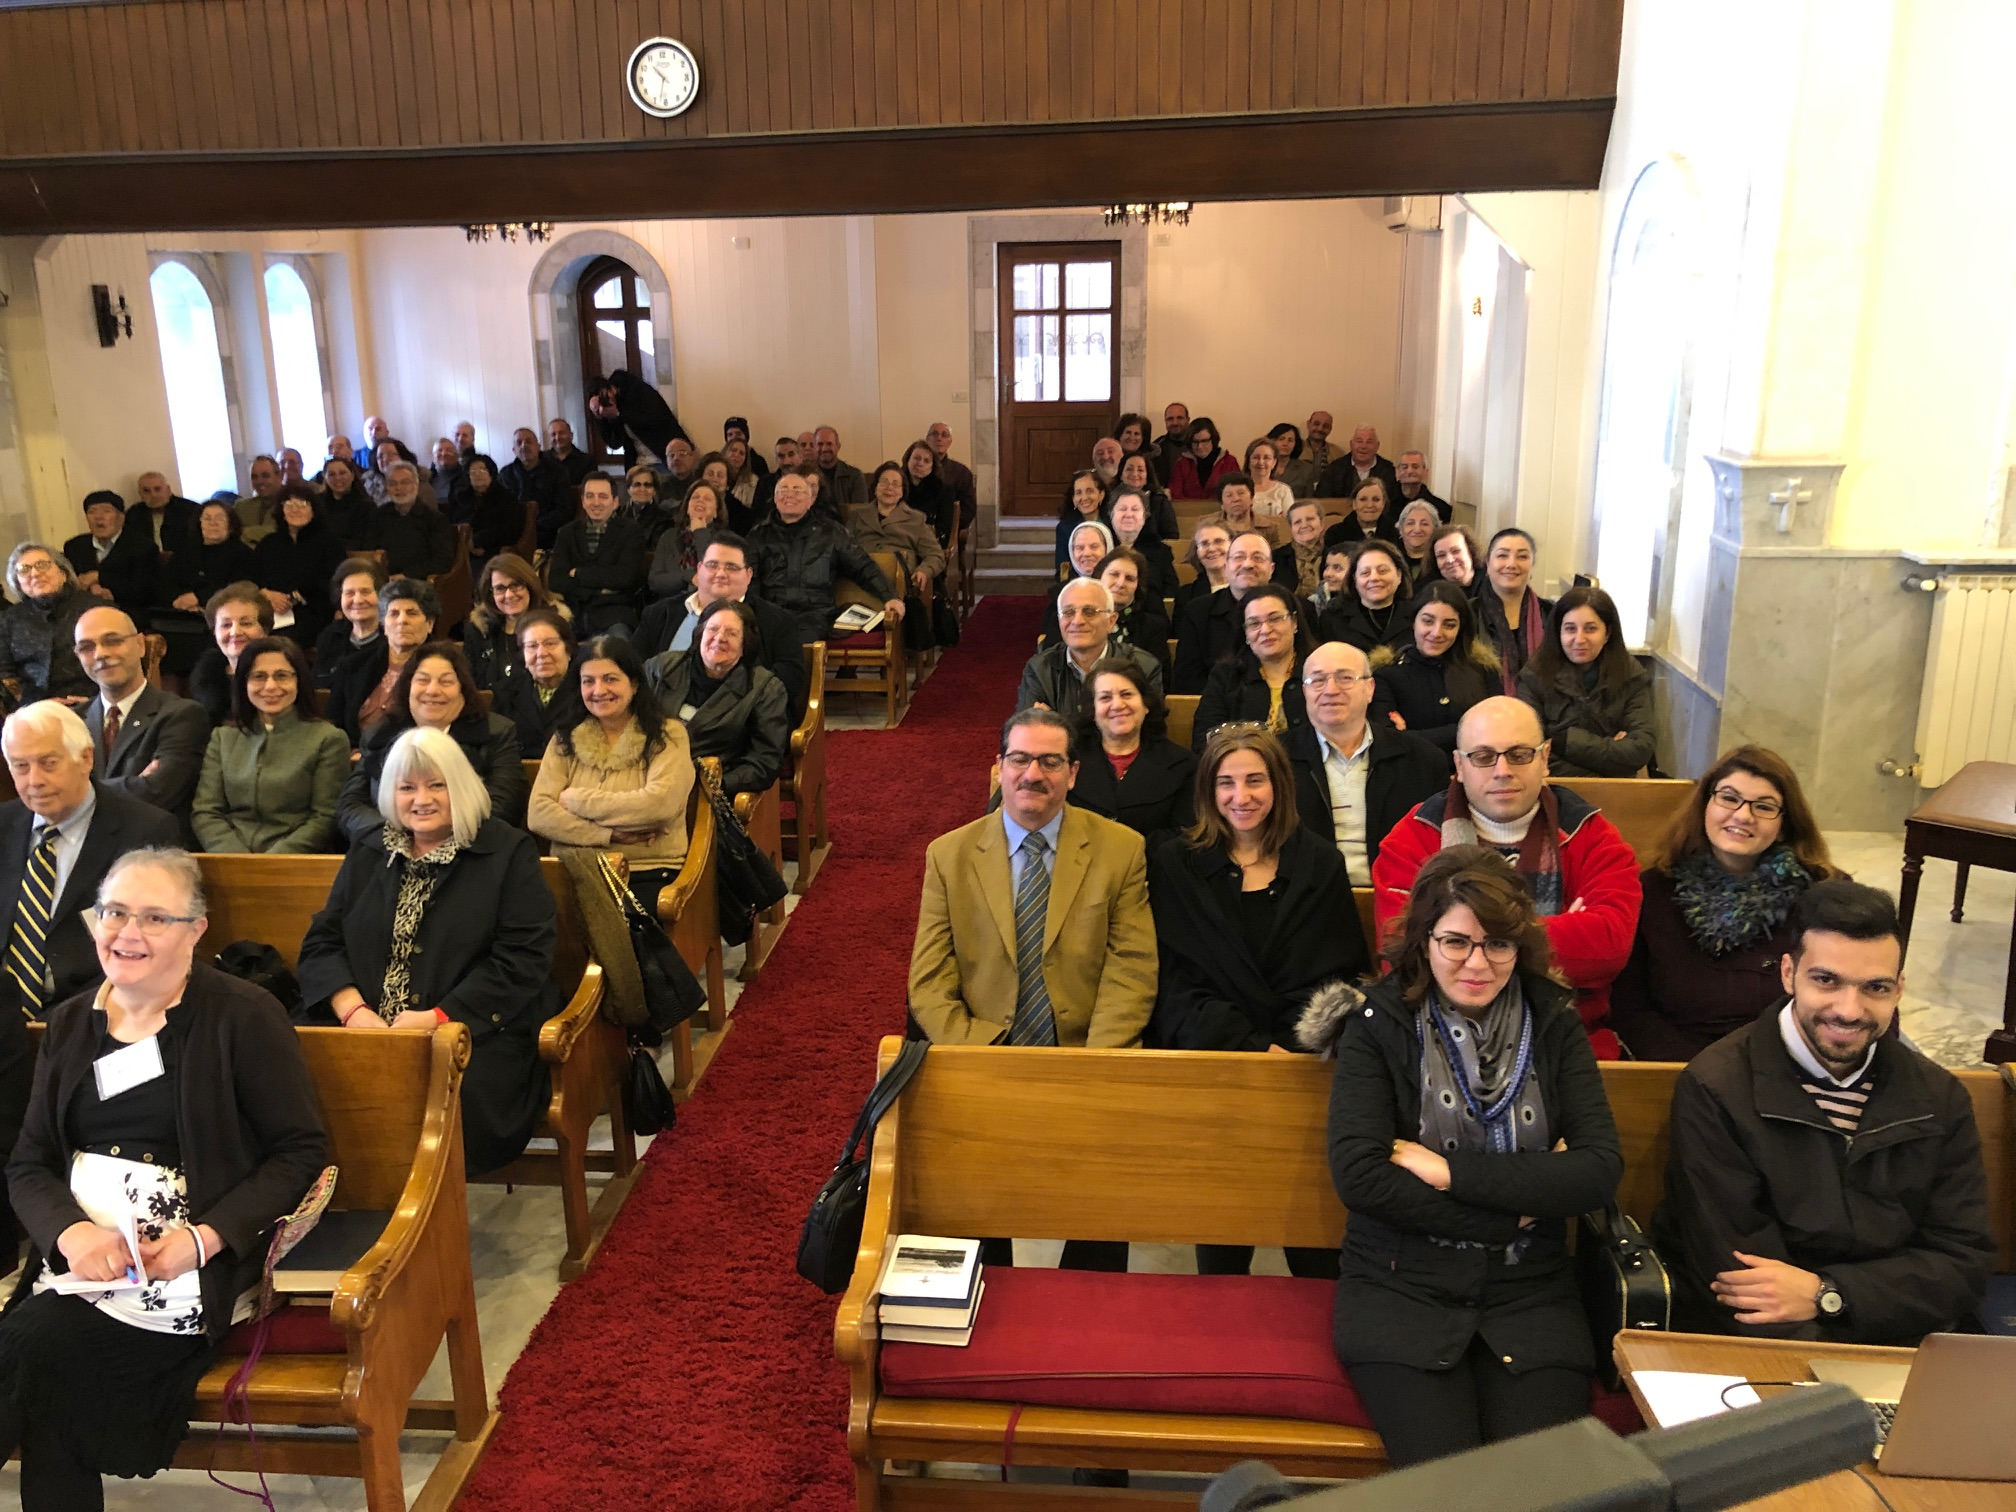 Full worship in Homs church